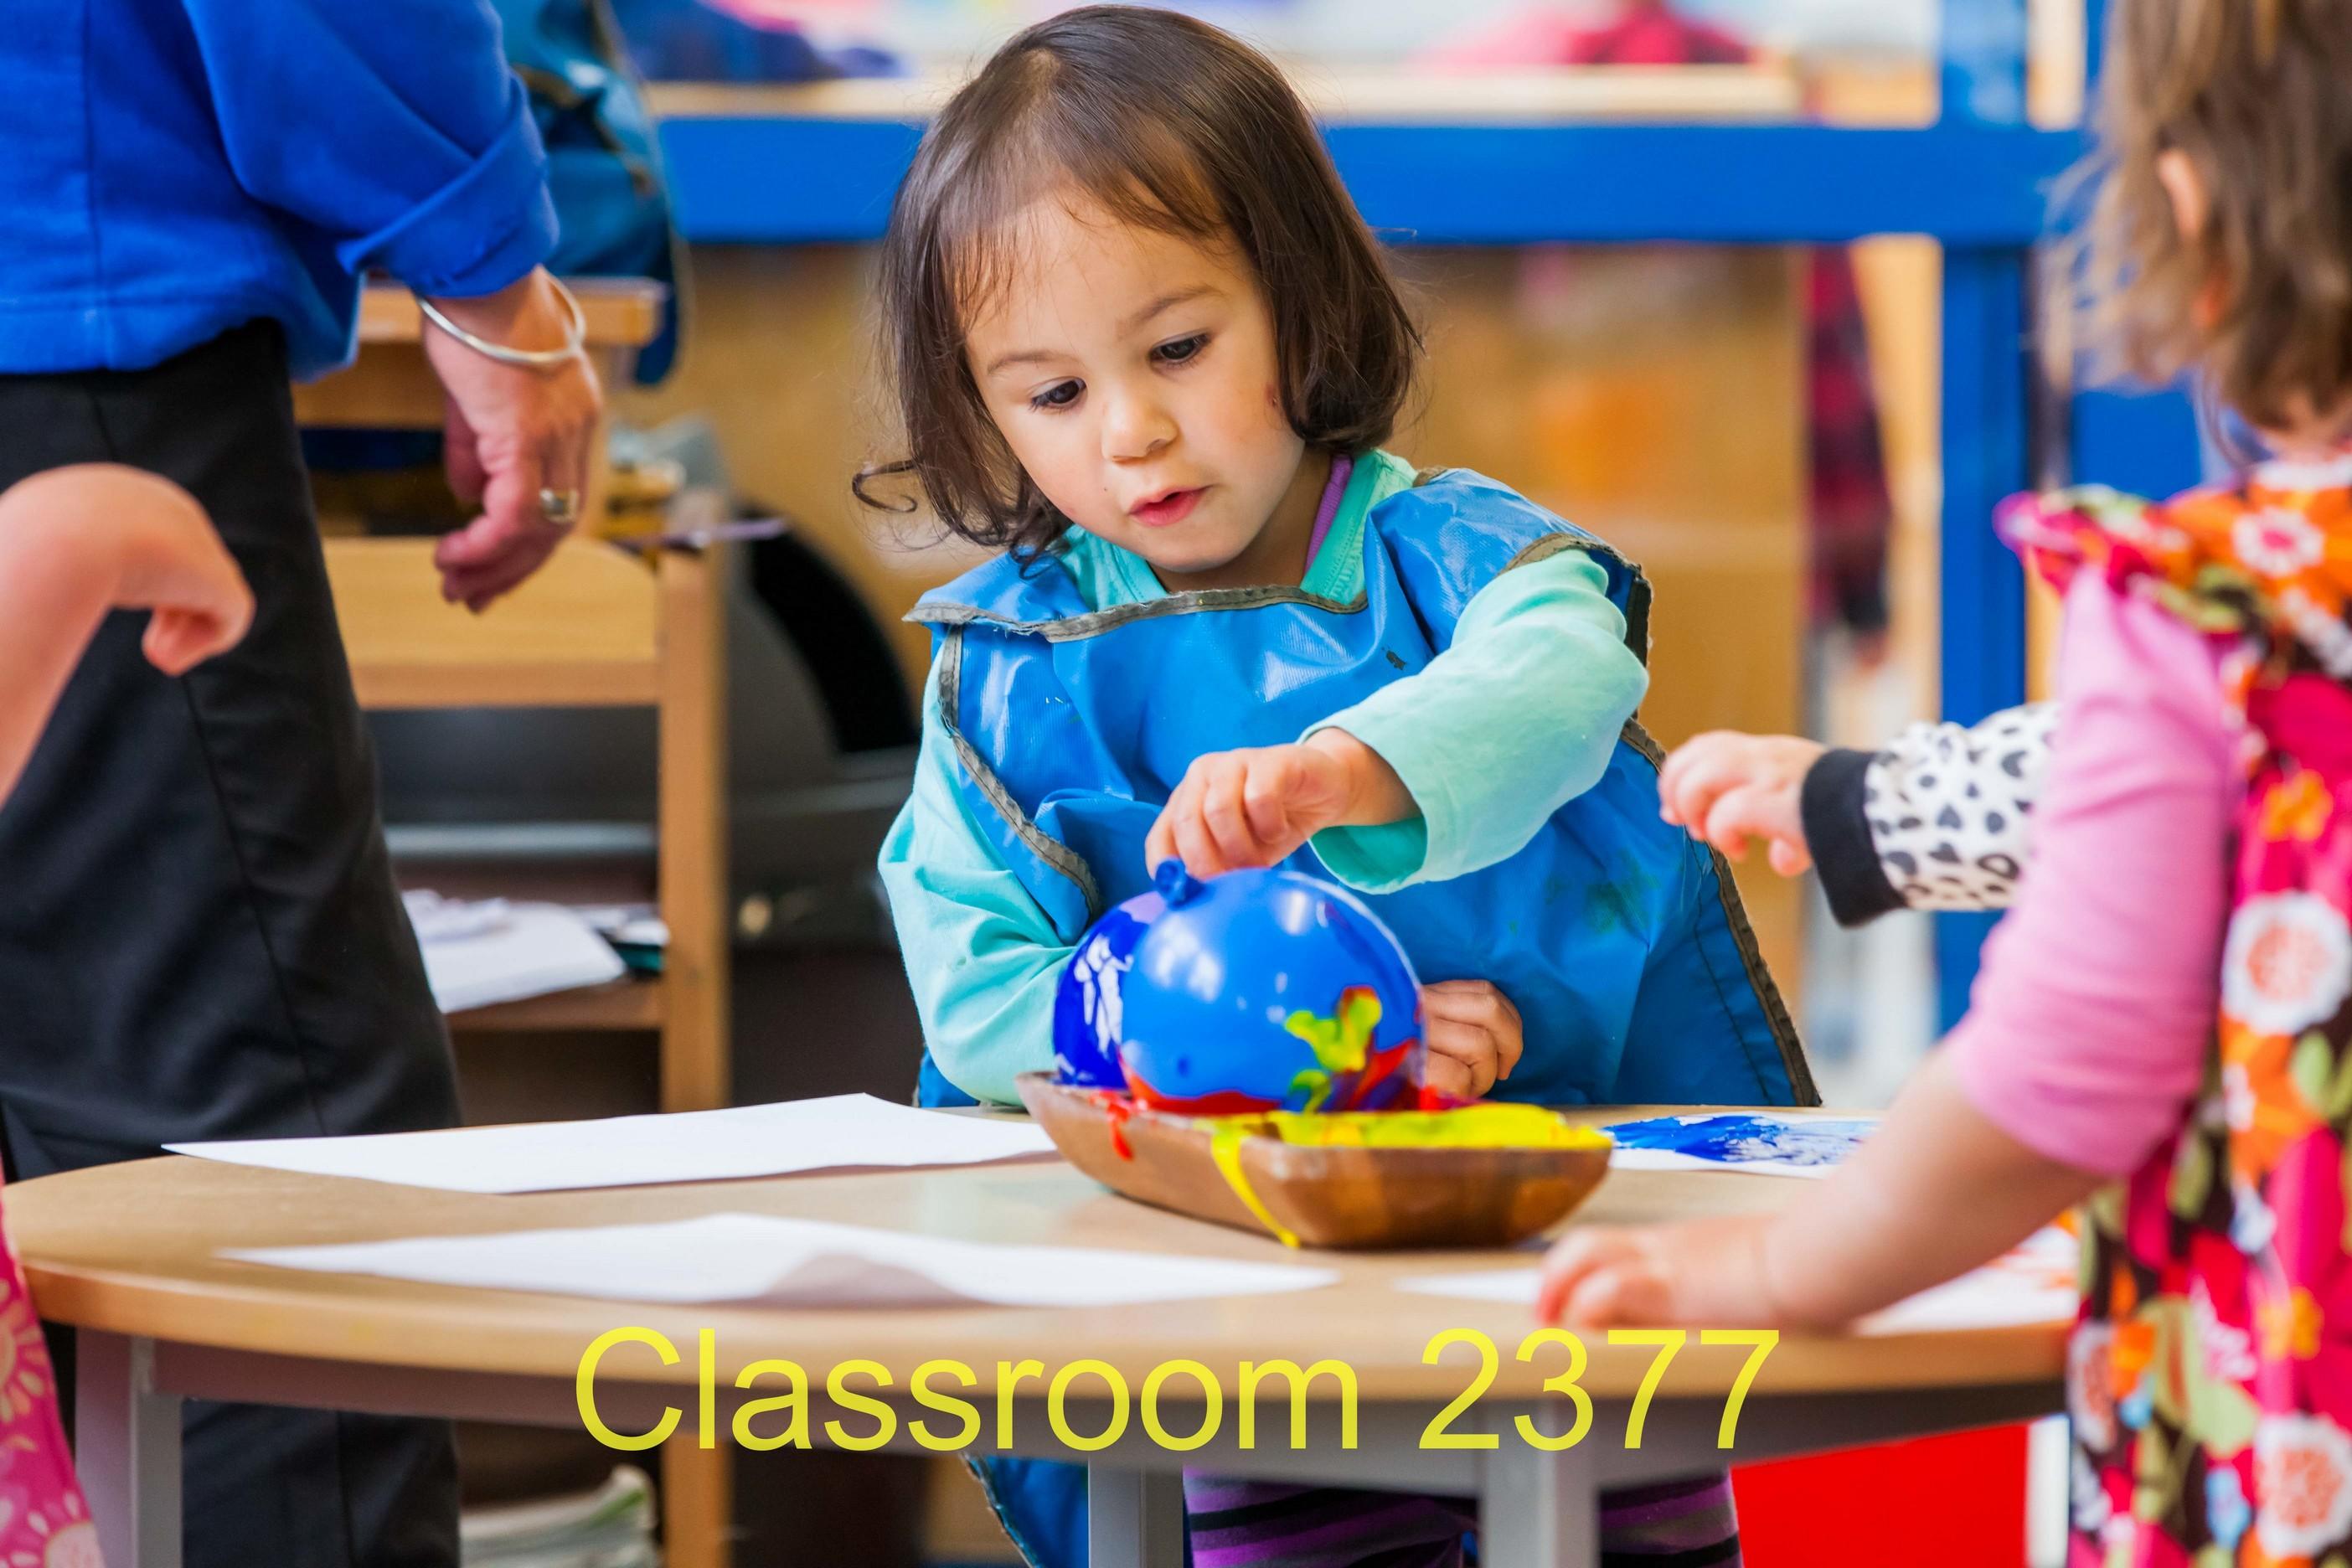 Classroom 2377